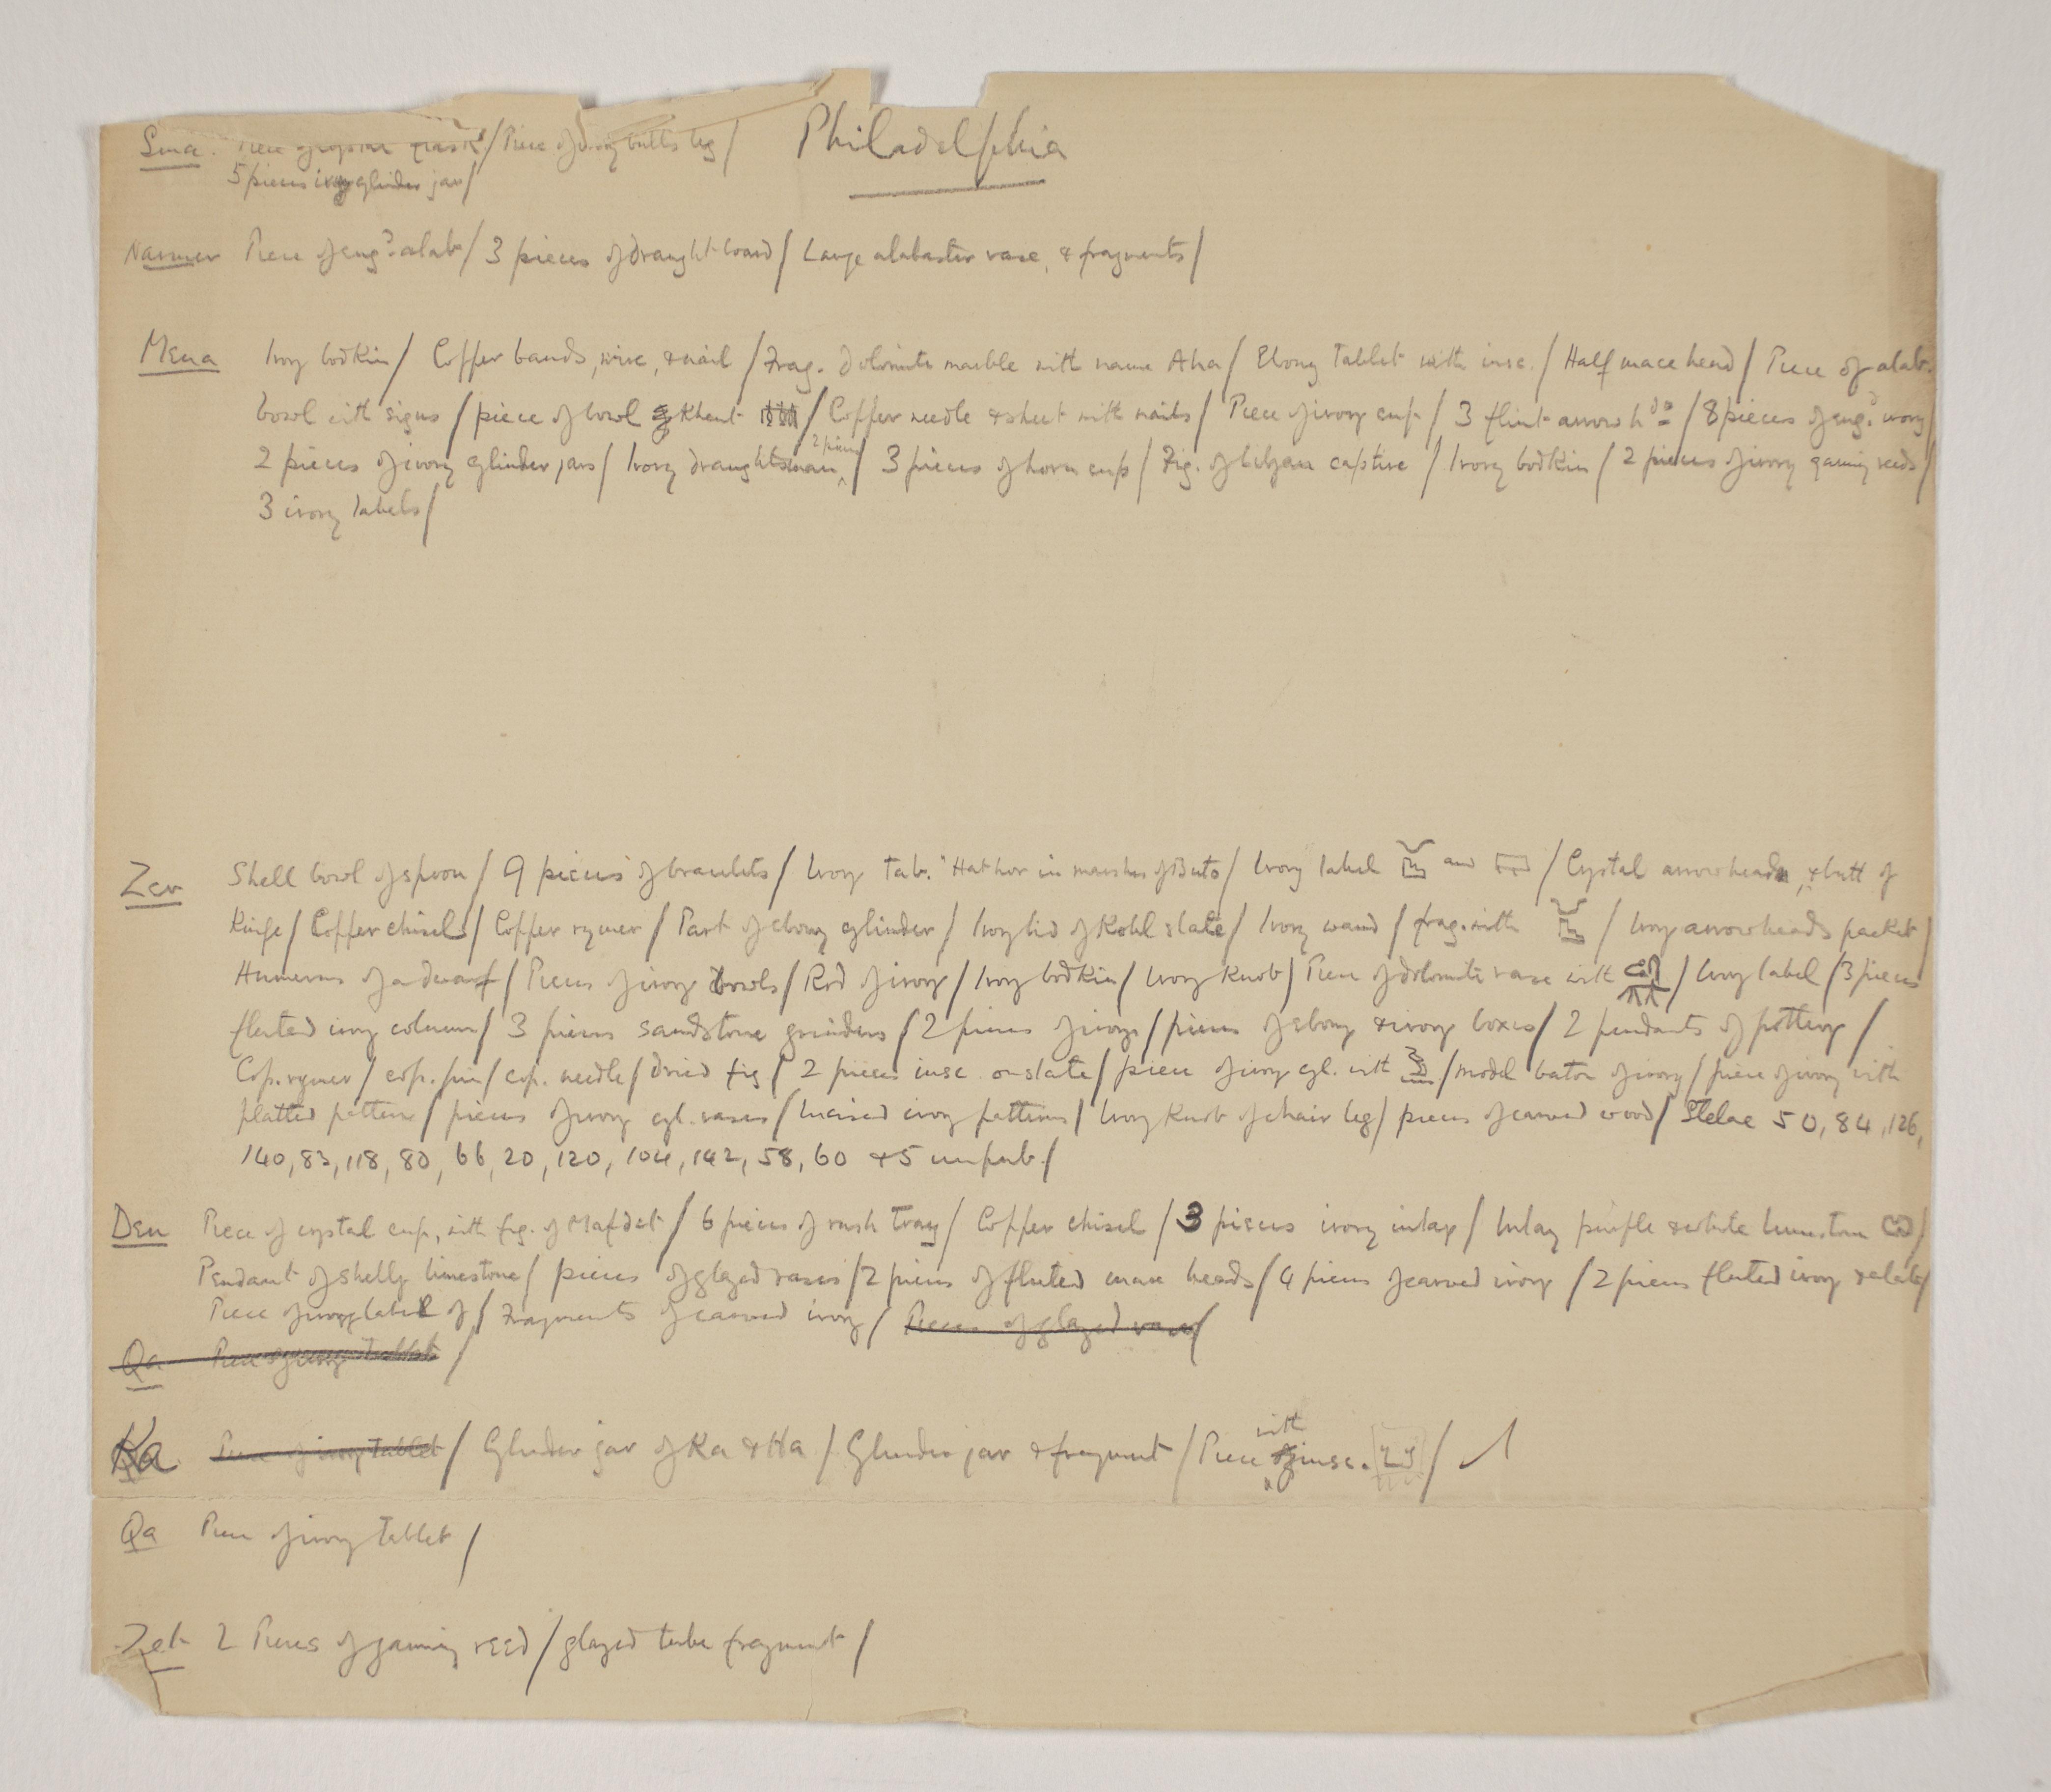 1900-01 Abydos, Bet Khallaf, el-Mahasna Individual institution list  PMA/WFP1/D/9/23